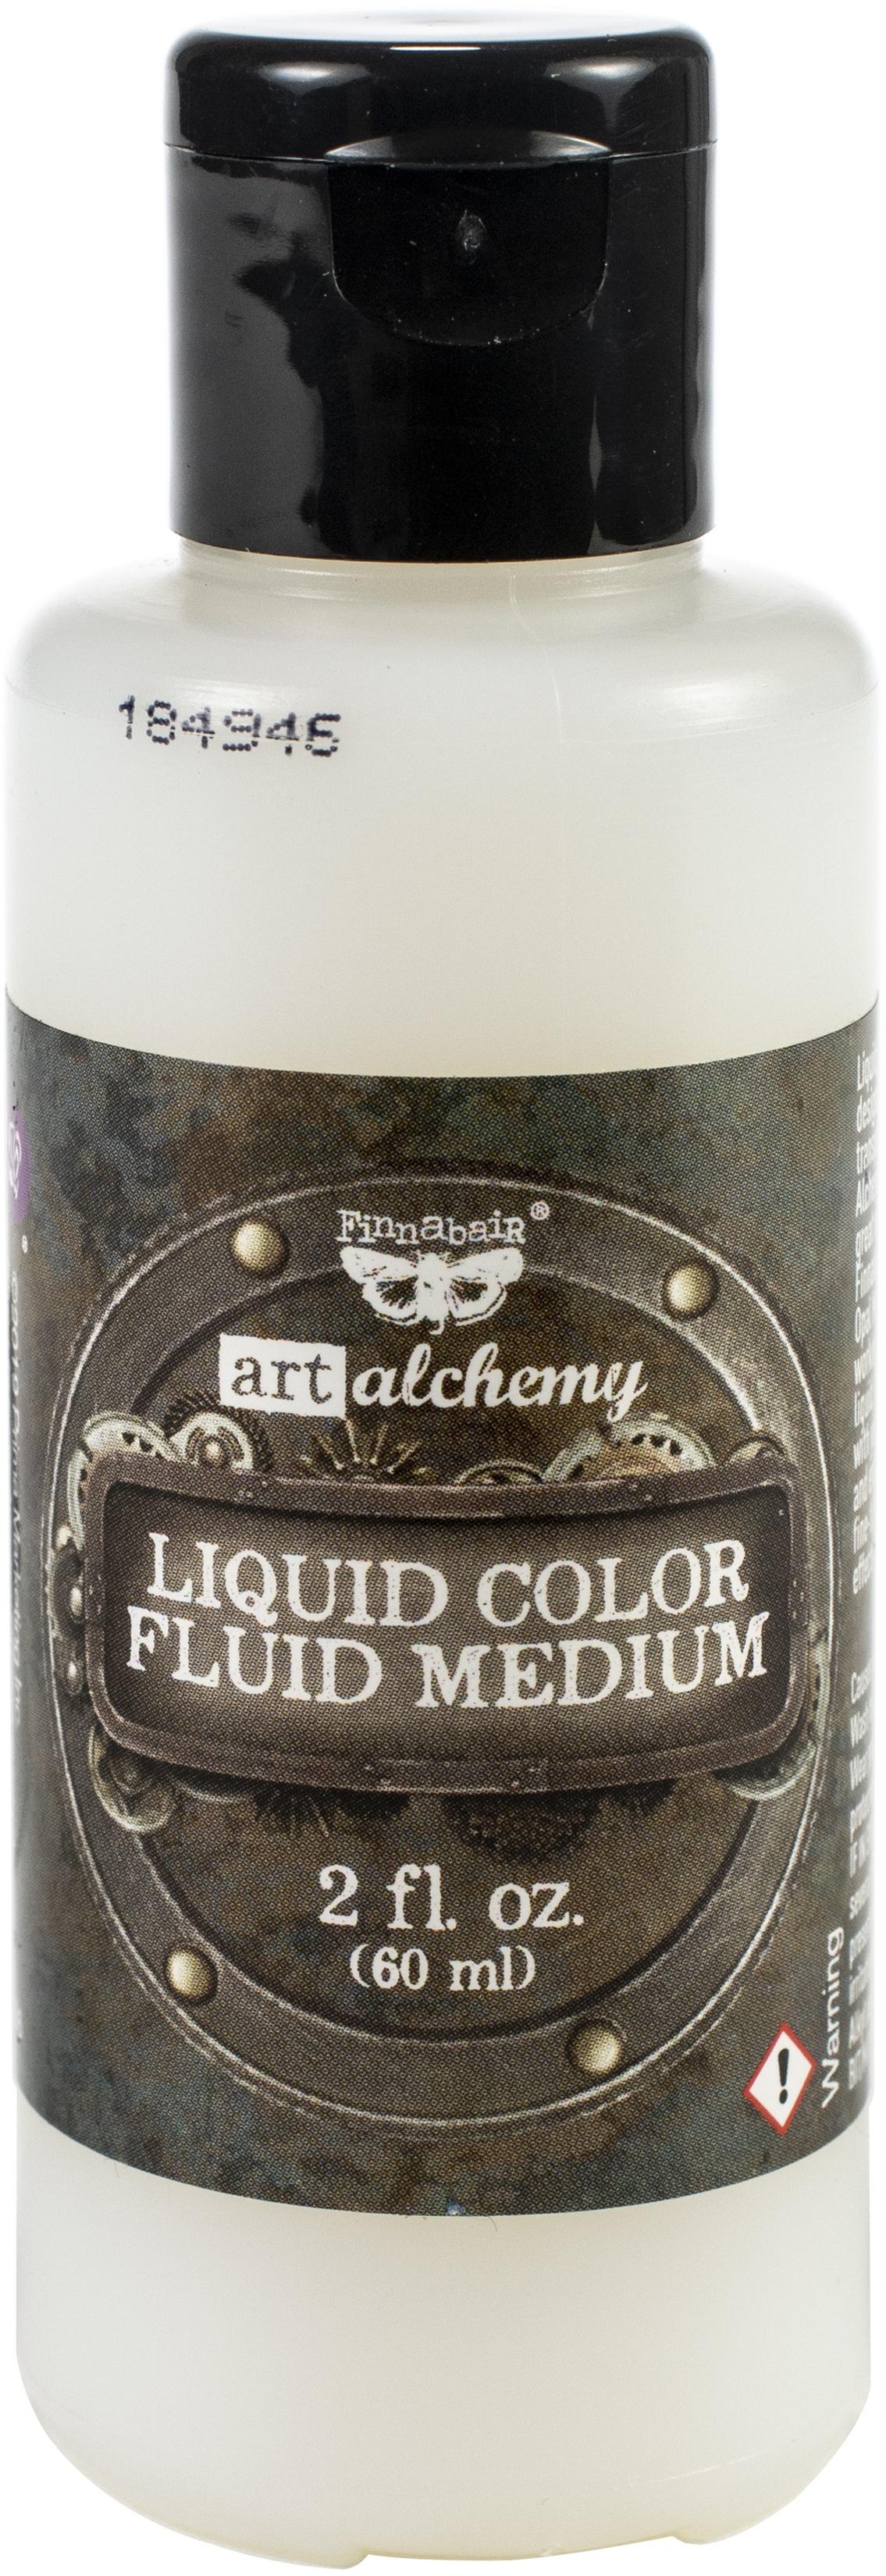 Art Alchemy Fluid Medium